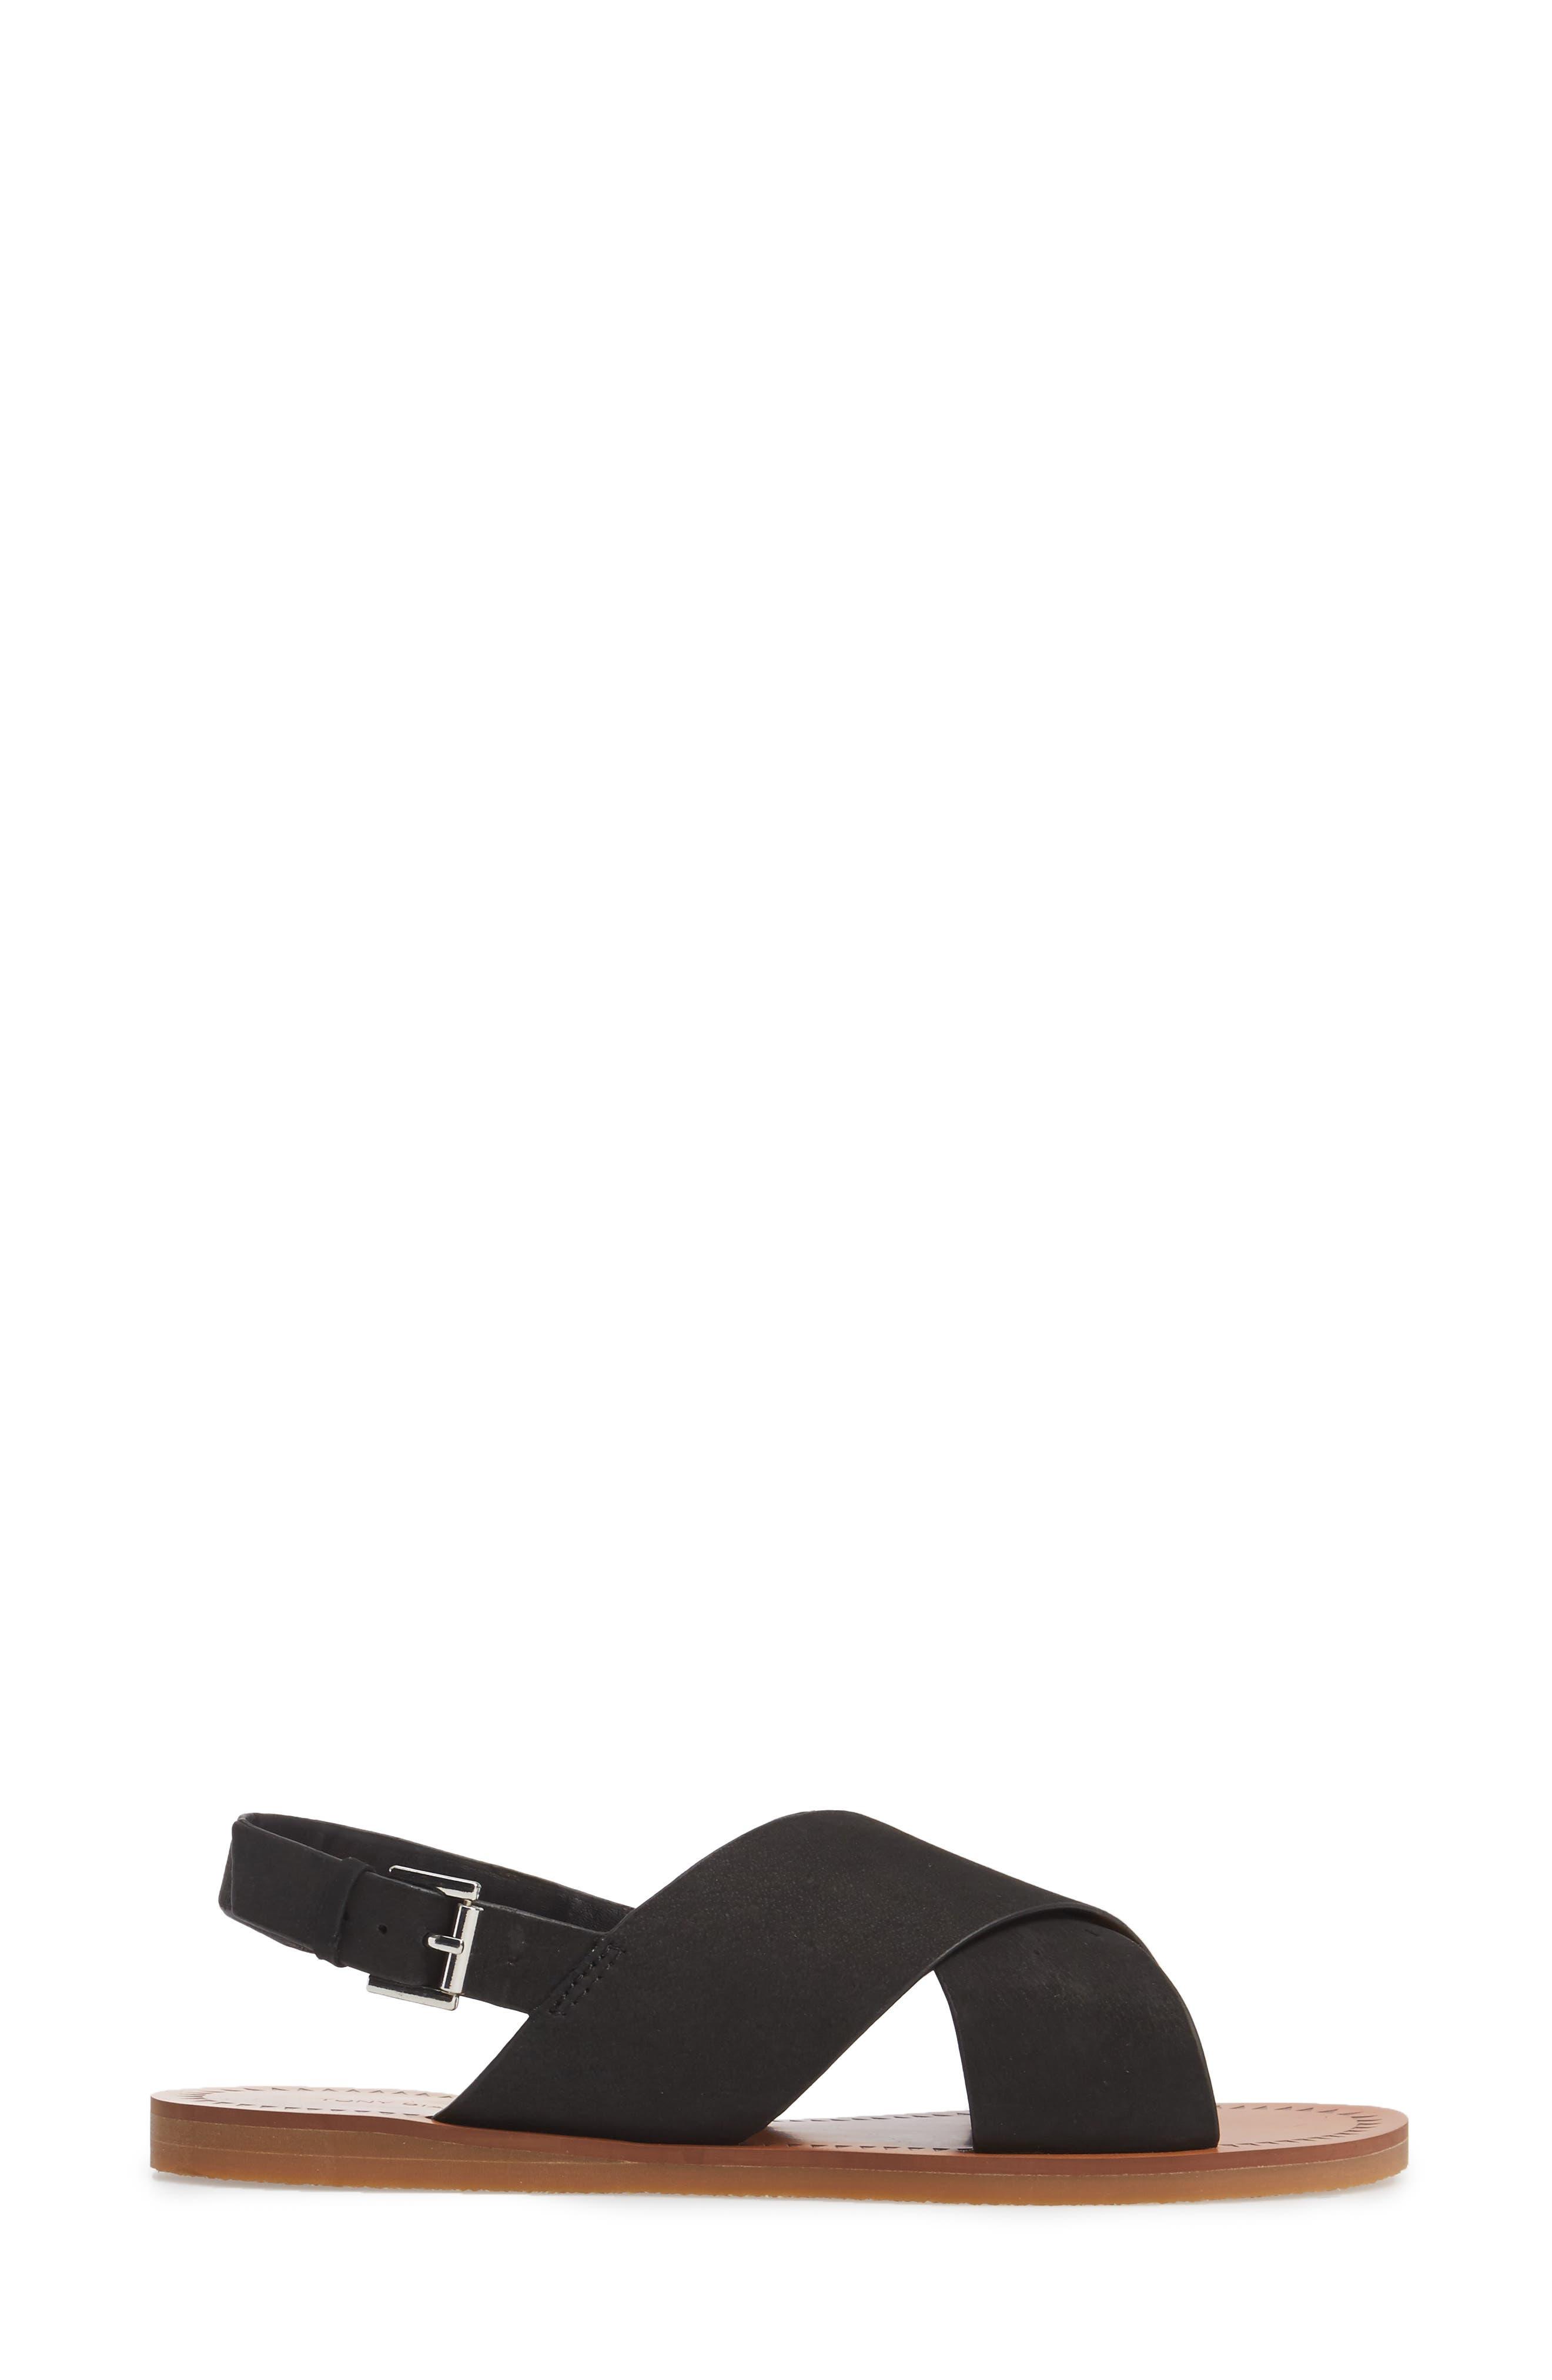 Henri Cross Strap Sandal,                             Alternate thumbnail 3, color,                             Black Phoenix